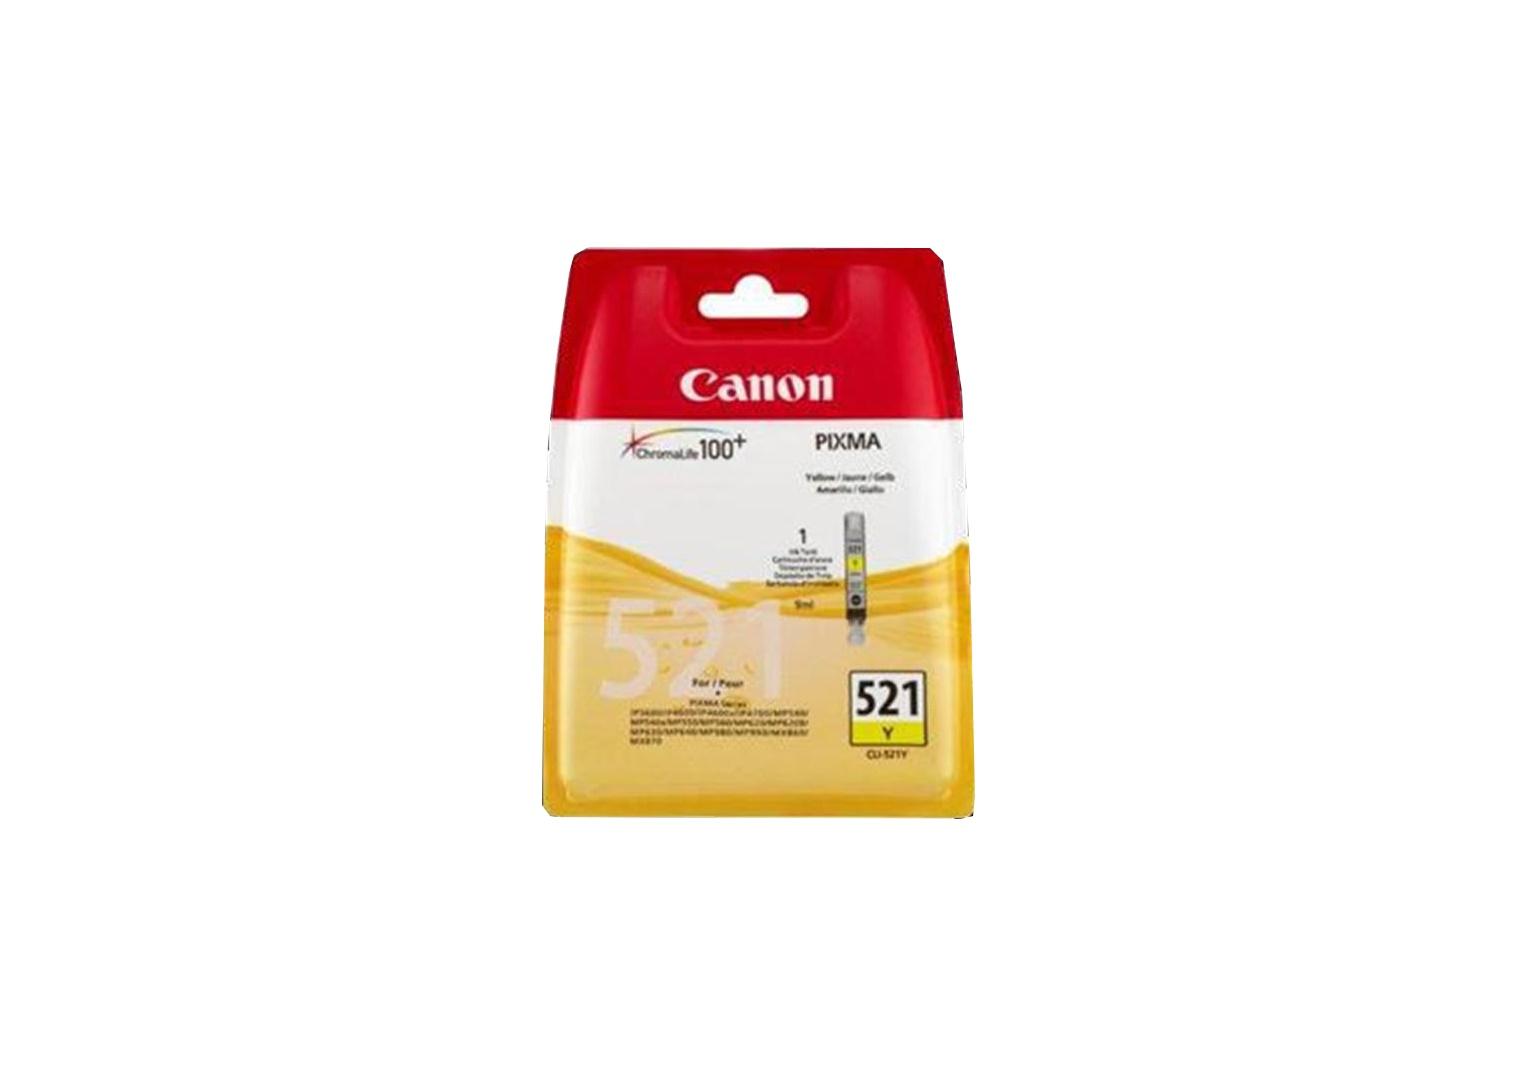 Vorschau: Original Canon CLI-521Y für PIXMA iP3600 4600 MP980 yellow